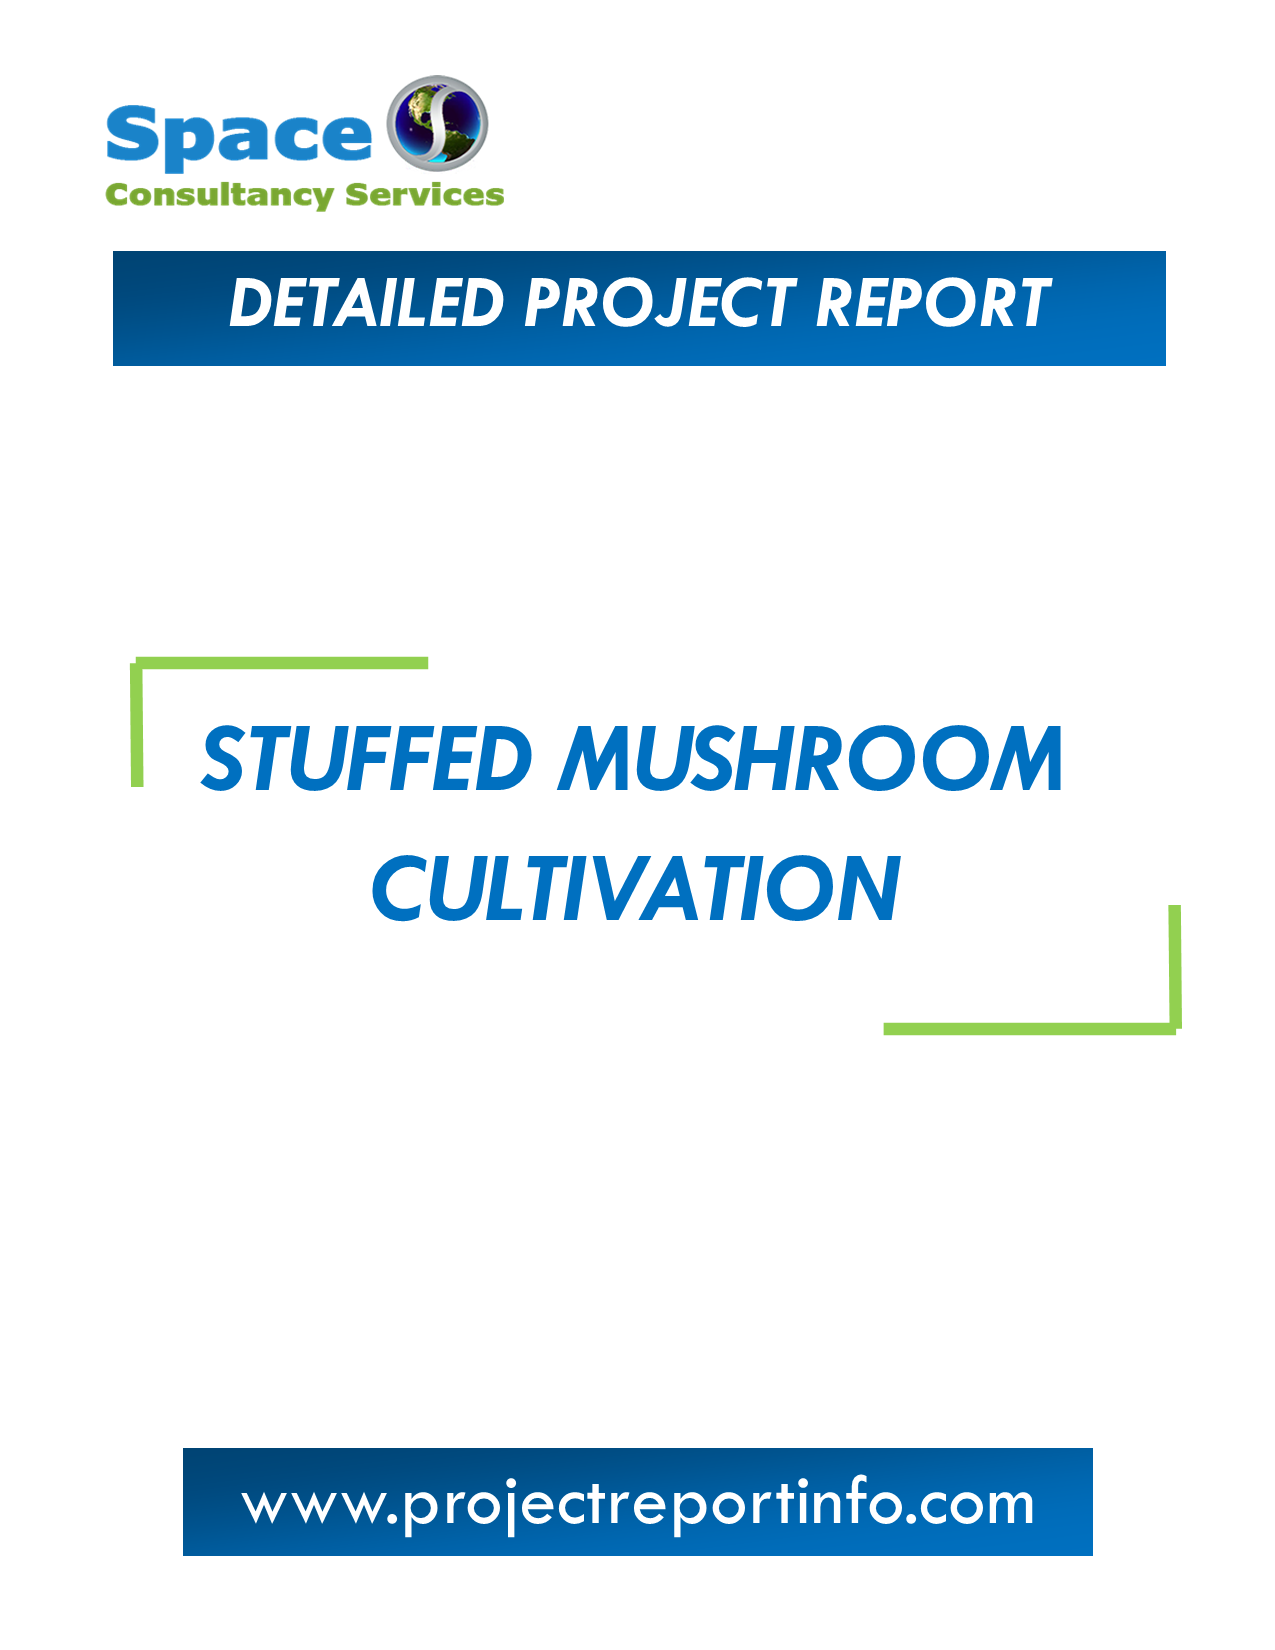 Project Report on Stuffed Mushroom Cultivation